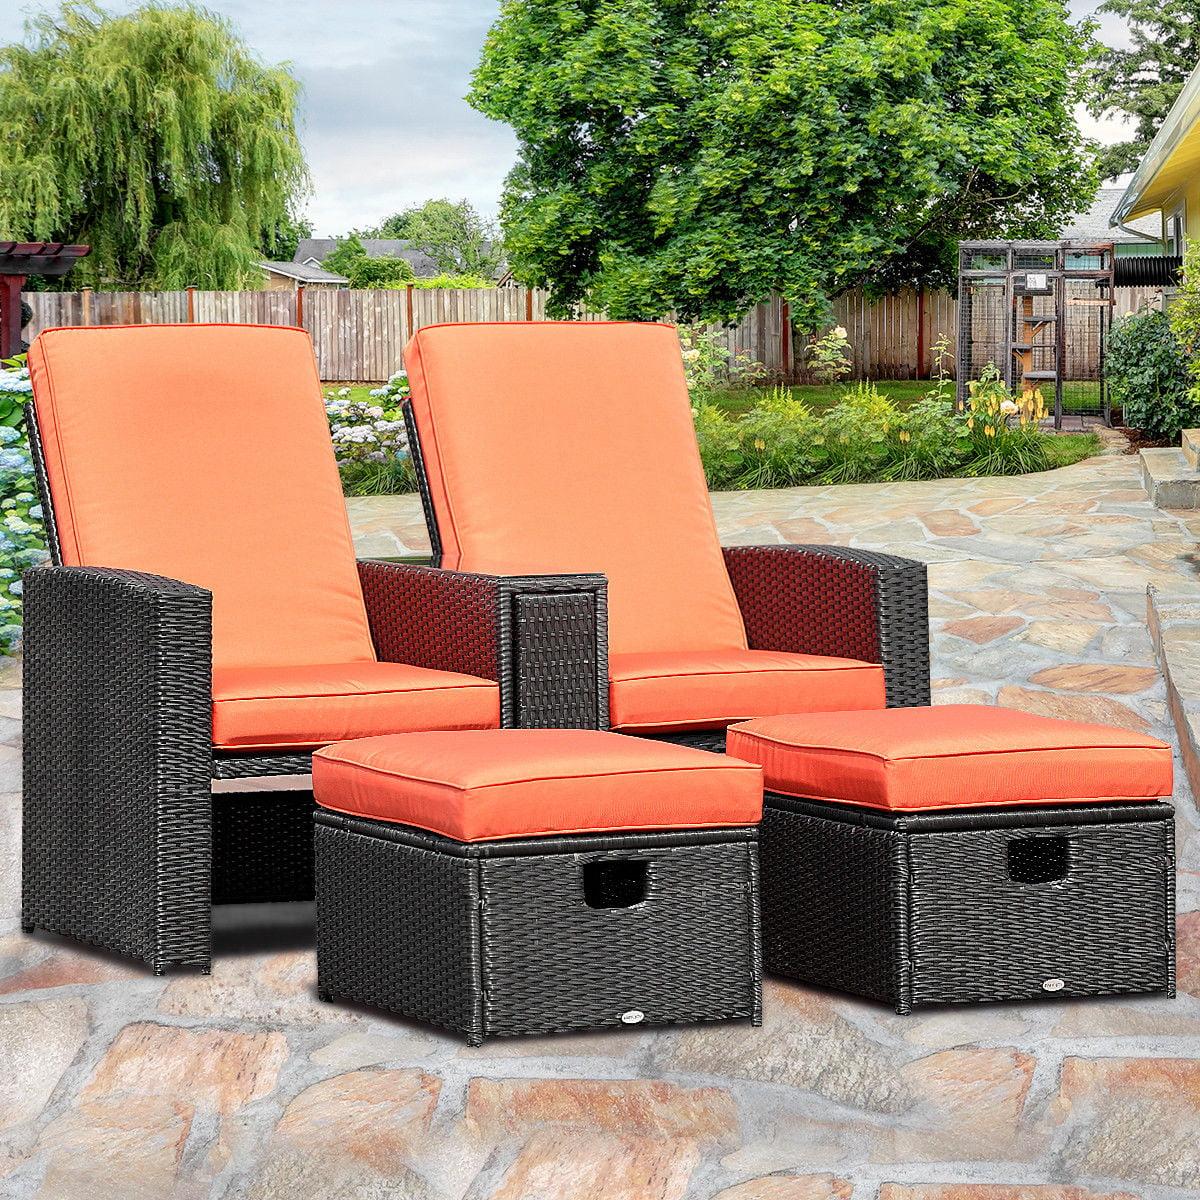 Gymax 3PCS Patio Furniture Reclining Recliner Set Adjustable Backrest Rattan Ottoman